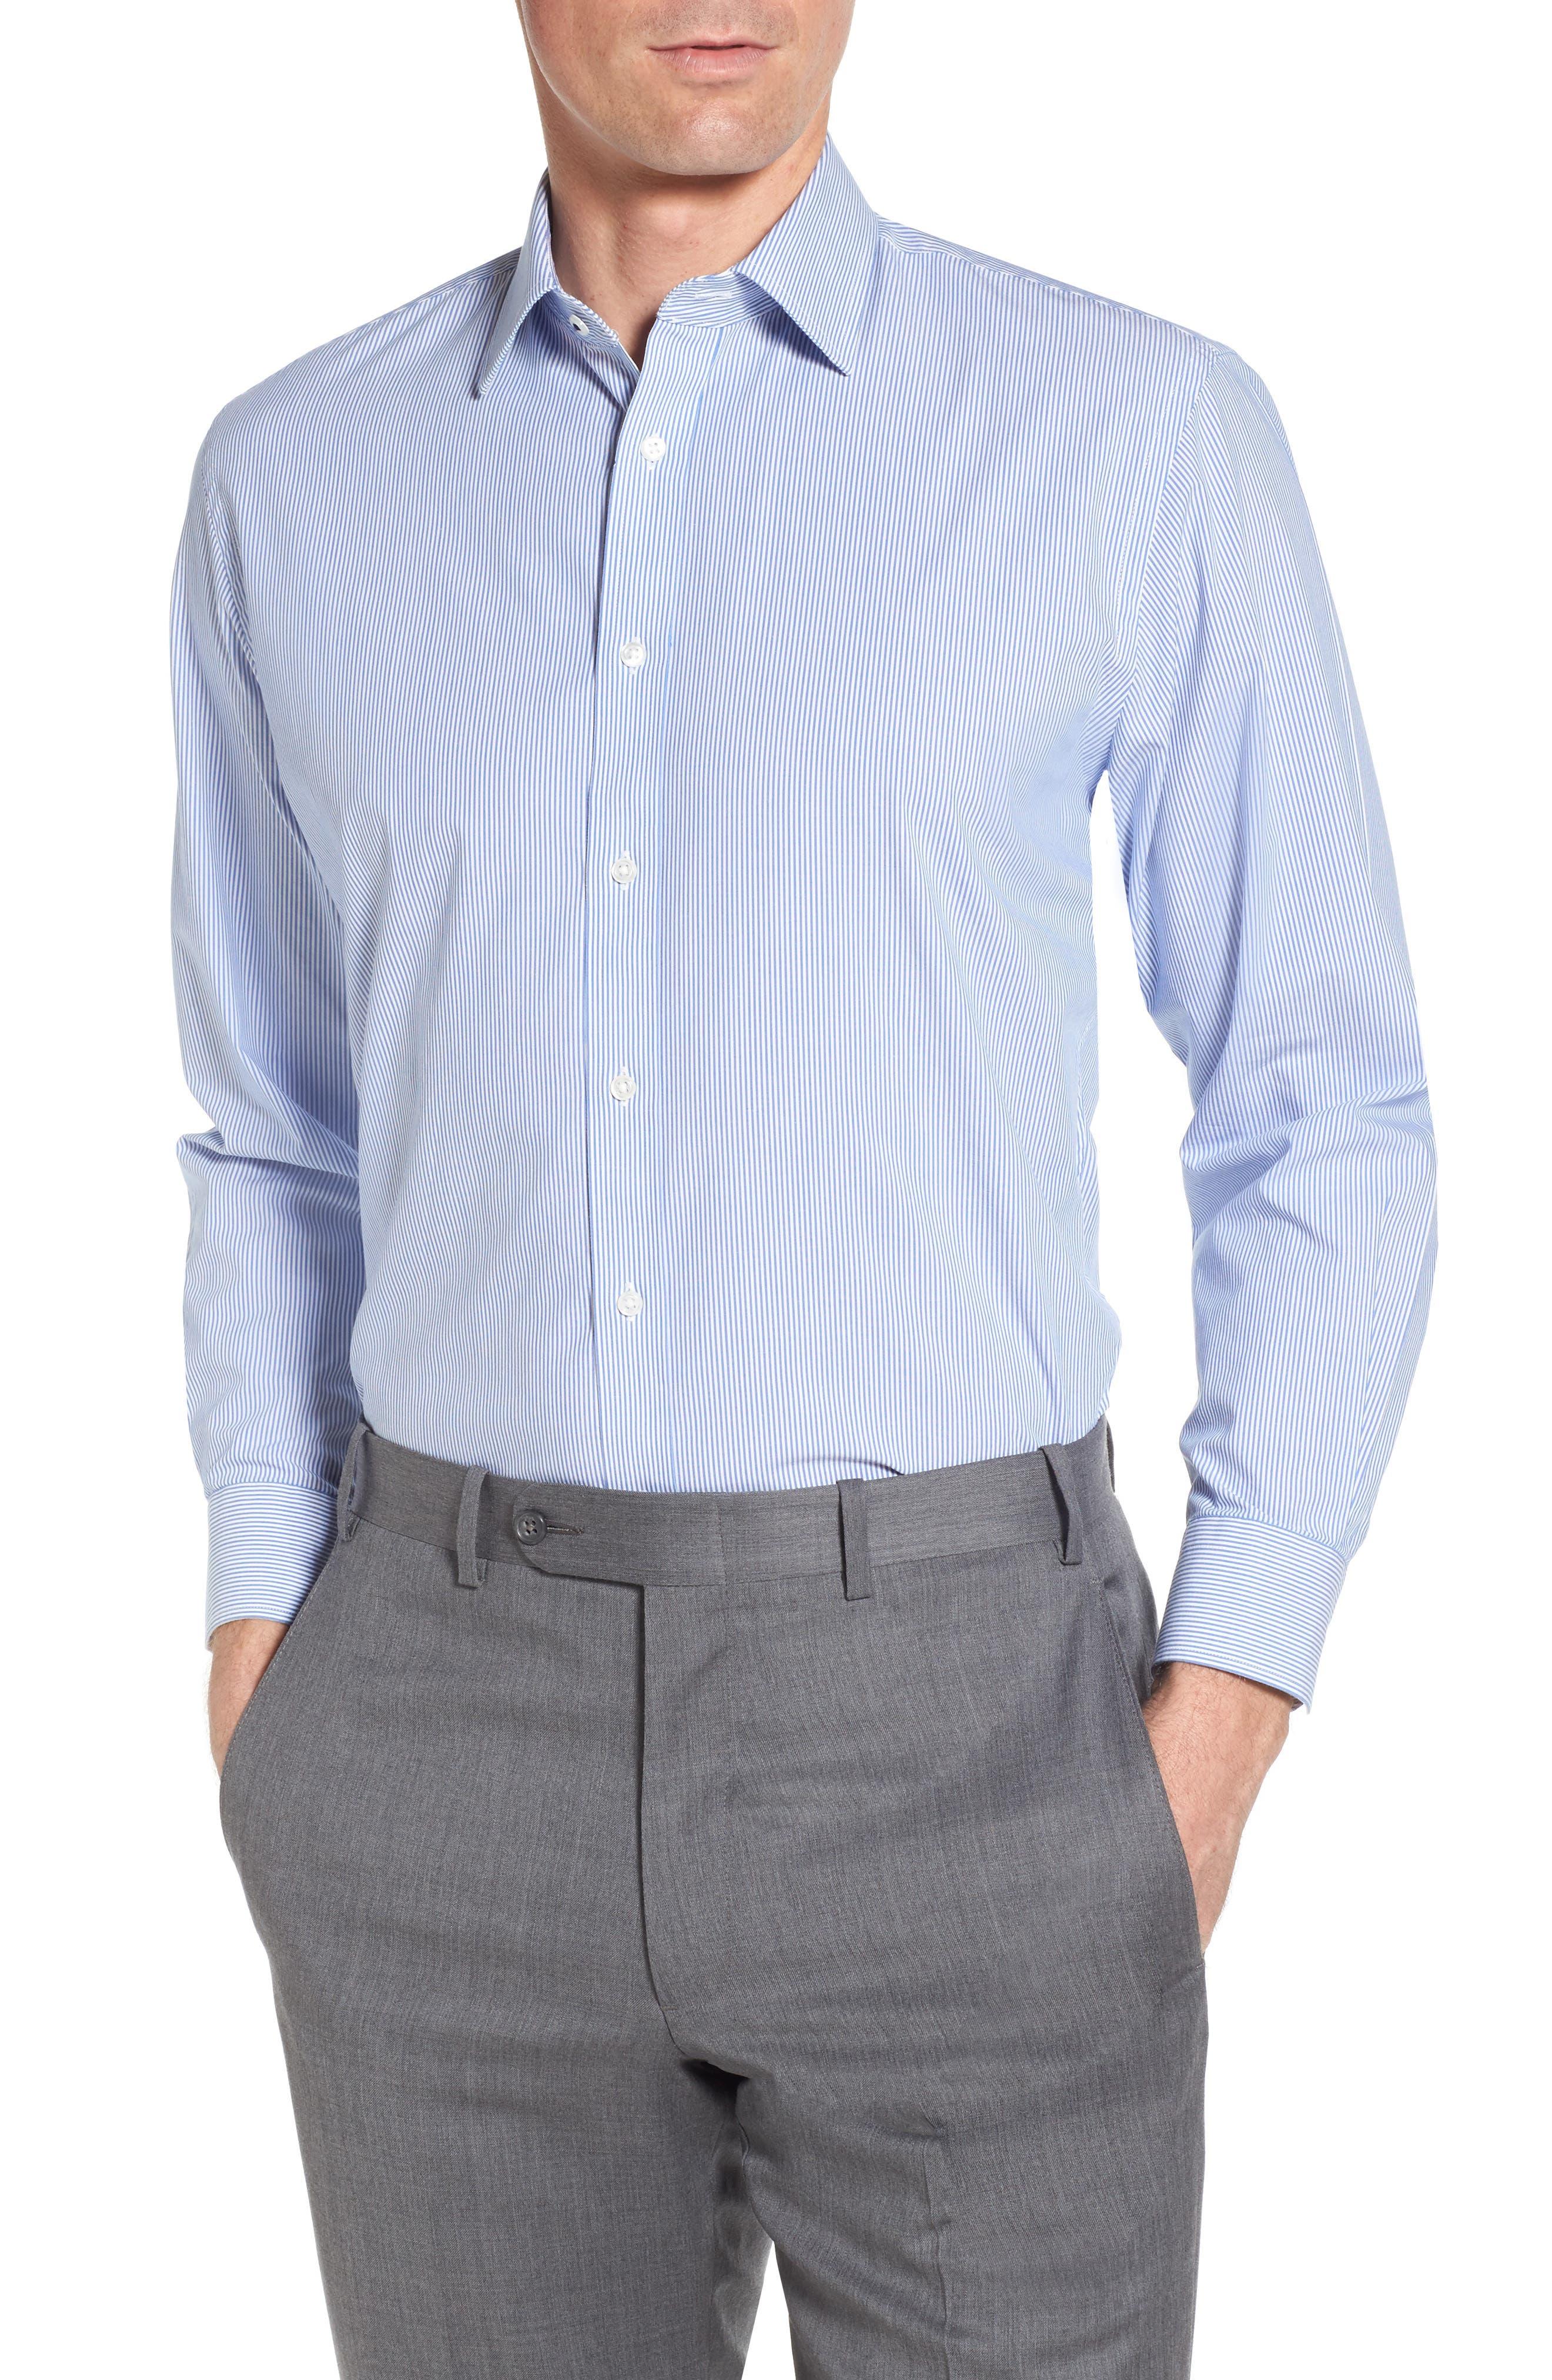 Tech-Smart Traditional Fit Stretch Stripe Dress Shirt,                             Main thumbnail 1, color,                             420